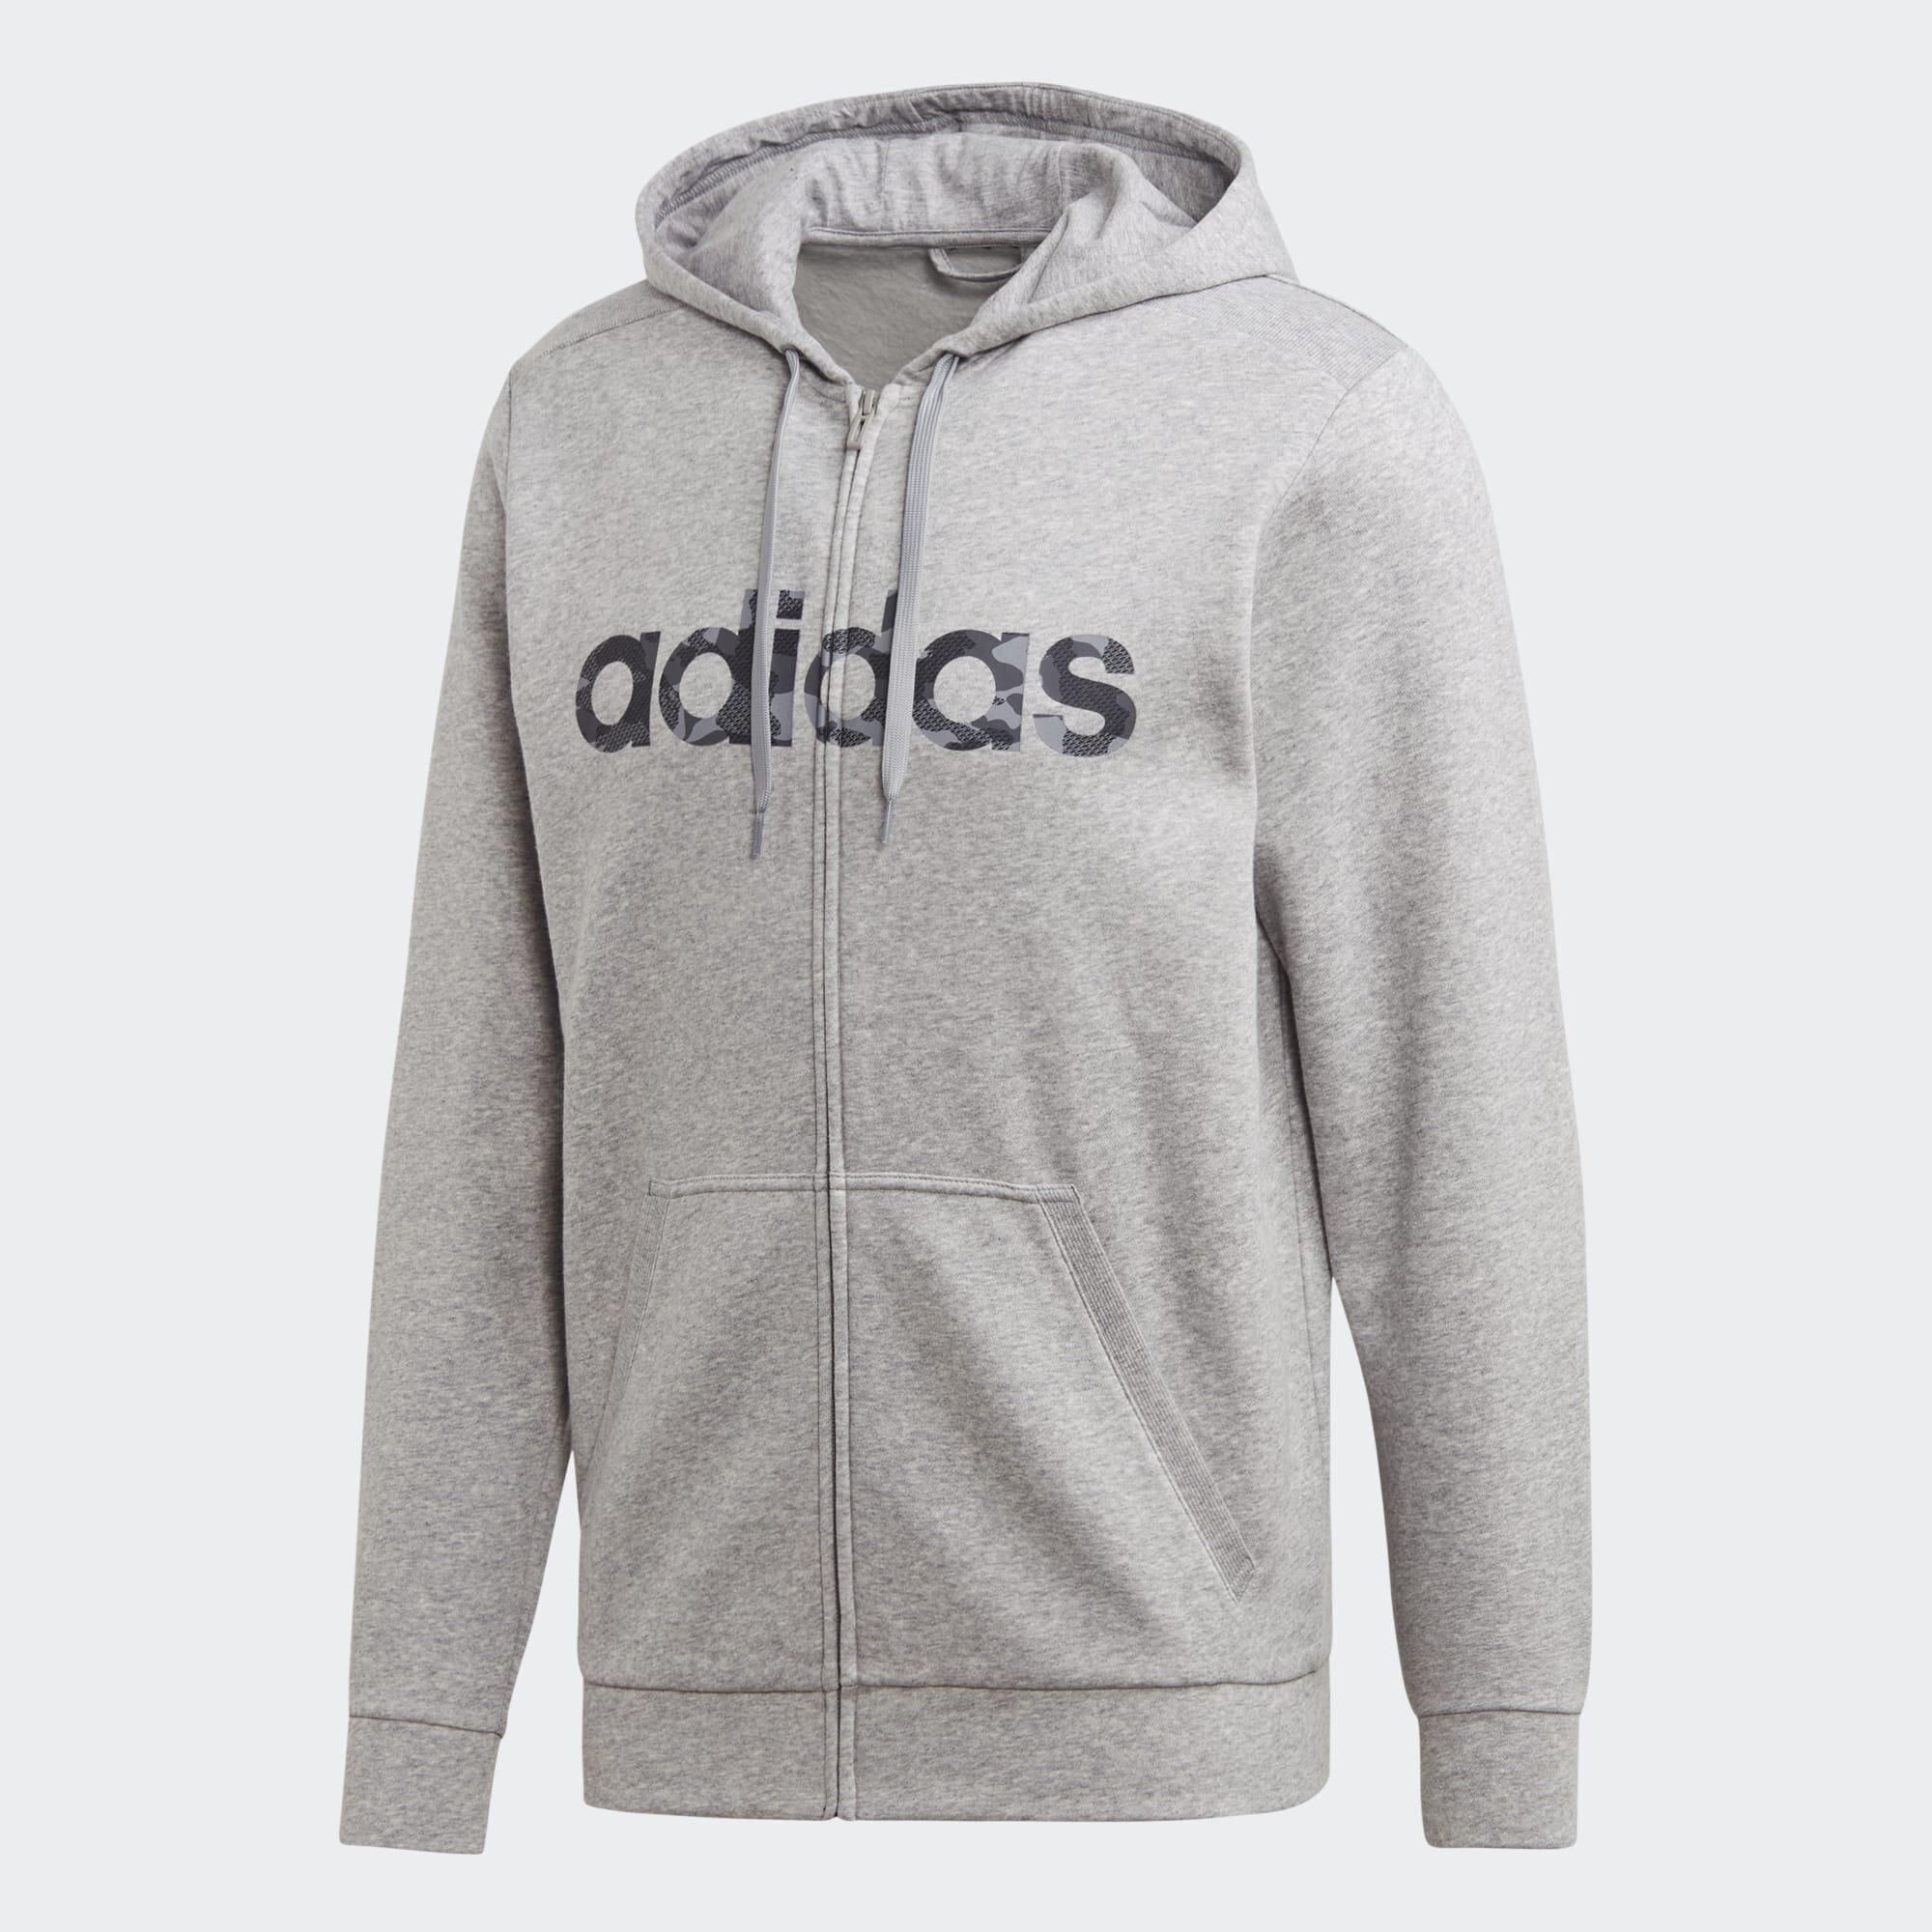 Shop Adidas Men adidas Overwear adidas Hoodies USA Online